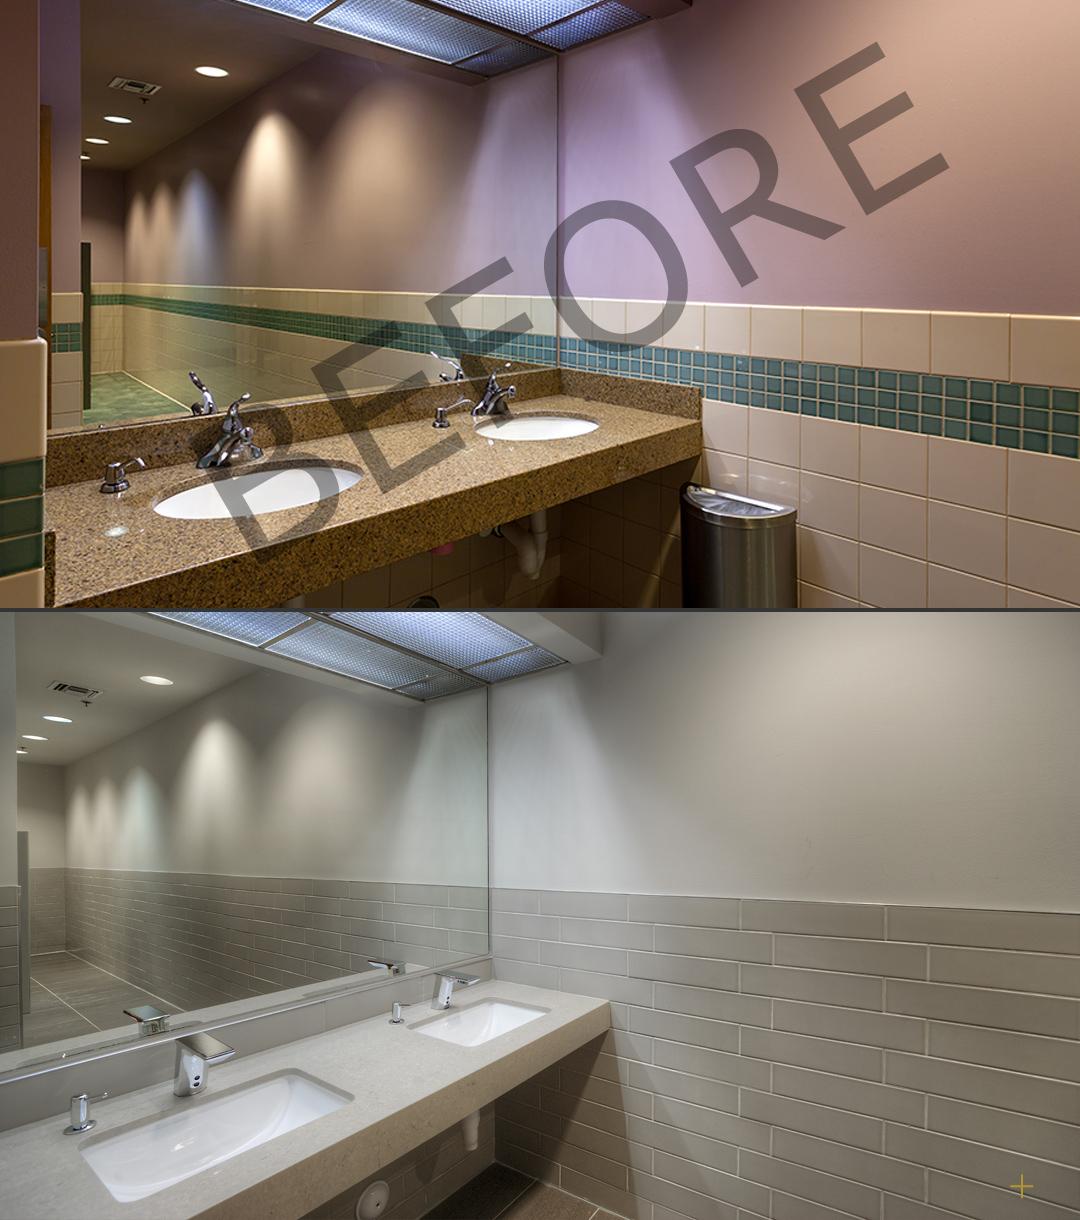 Before-After-sink.jpg